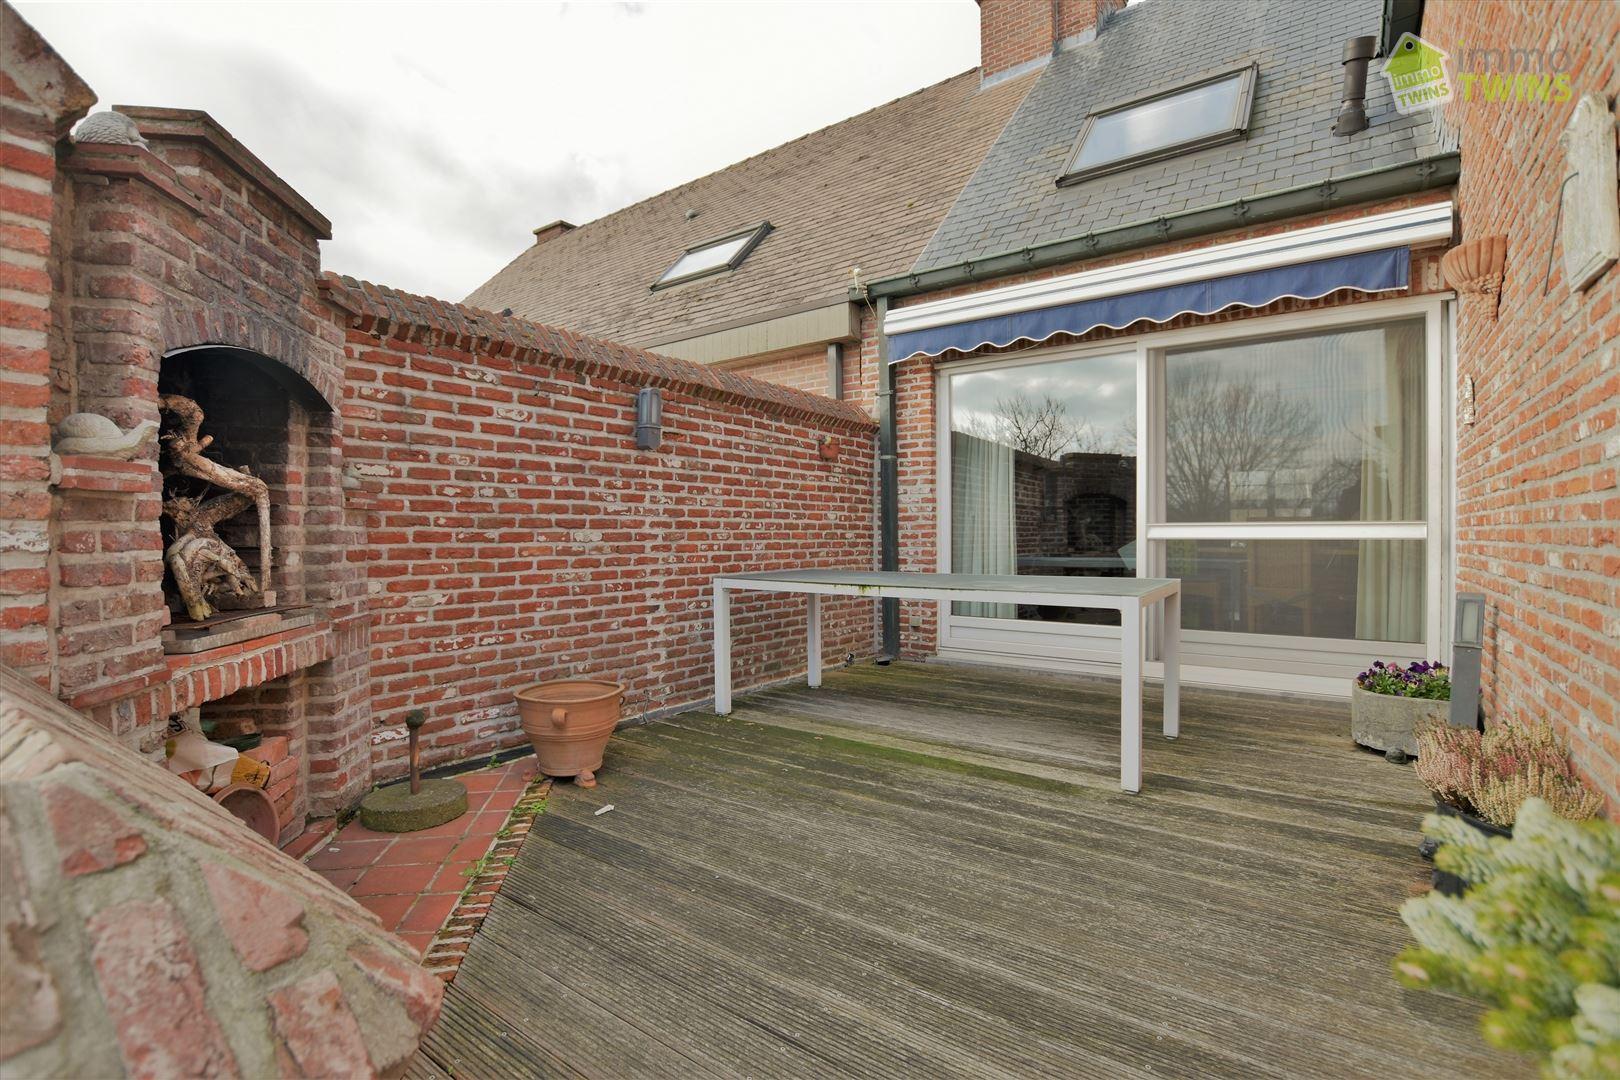 Foto 15 : Duplex/triplex te 9200 Dendermonde (België) - Prijs € 398.000